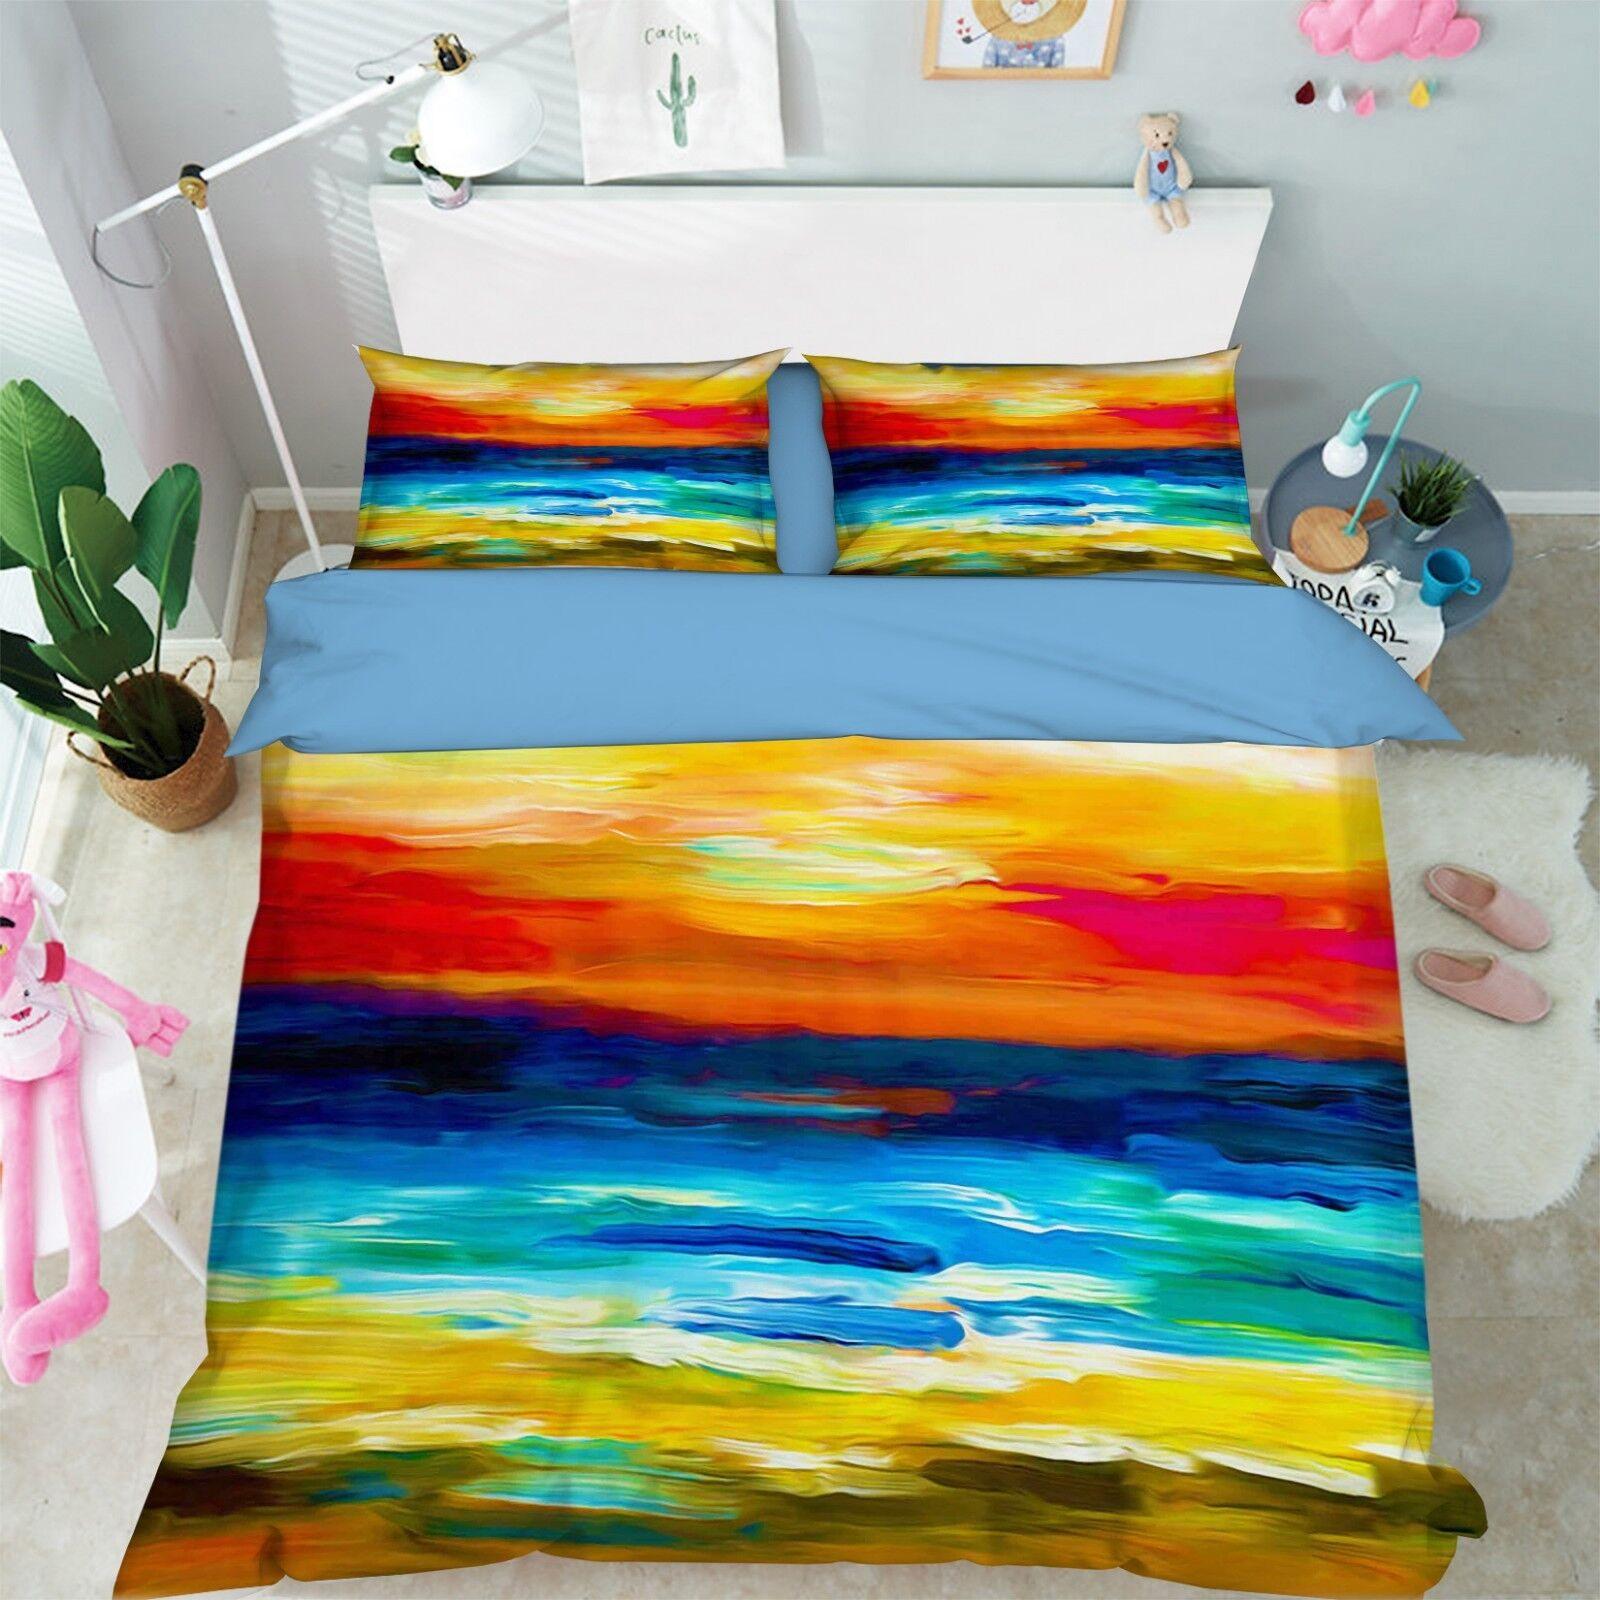 3D Landscape Paint 7 Bed Pillowcases Quilt Duvet Cover Set Single King UK Summer